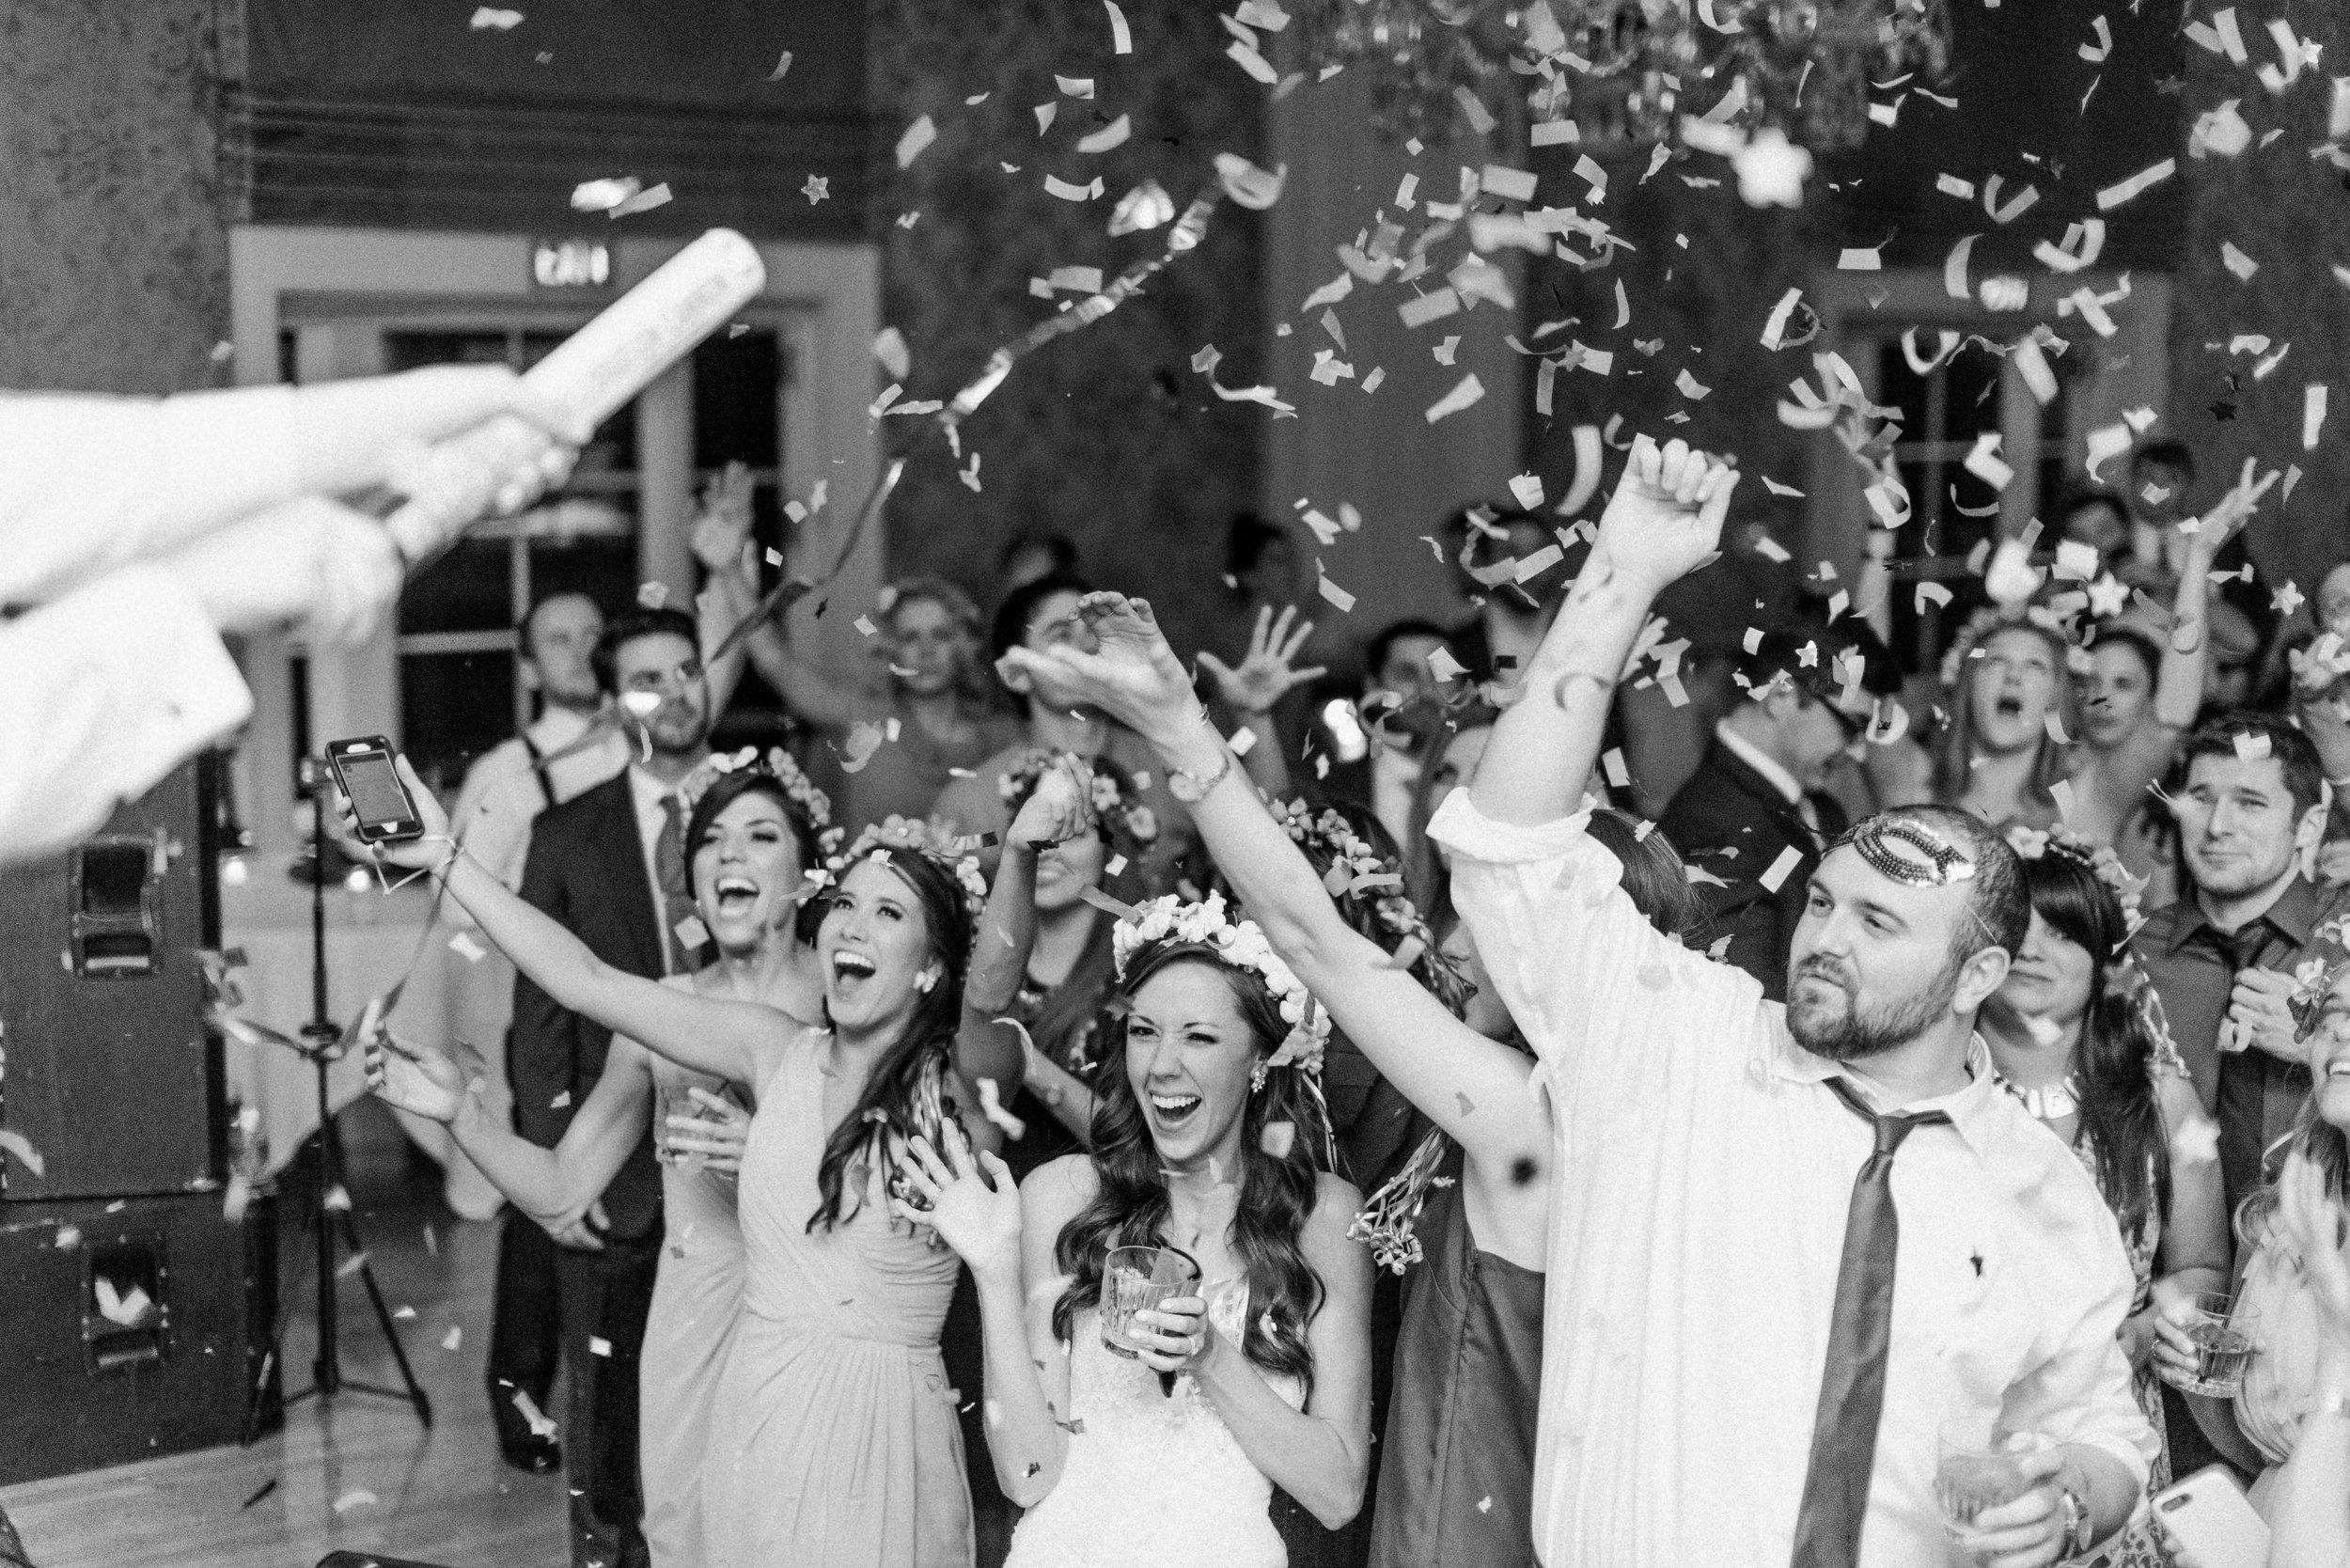 St.-Philip-Presbyterian-Church-Houston-Wedding-Ceremony-The-Junior-League-Of-Houston-Reception-Dana-Fernandez-Photography-Fine-Art-Film-38.jpg